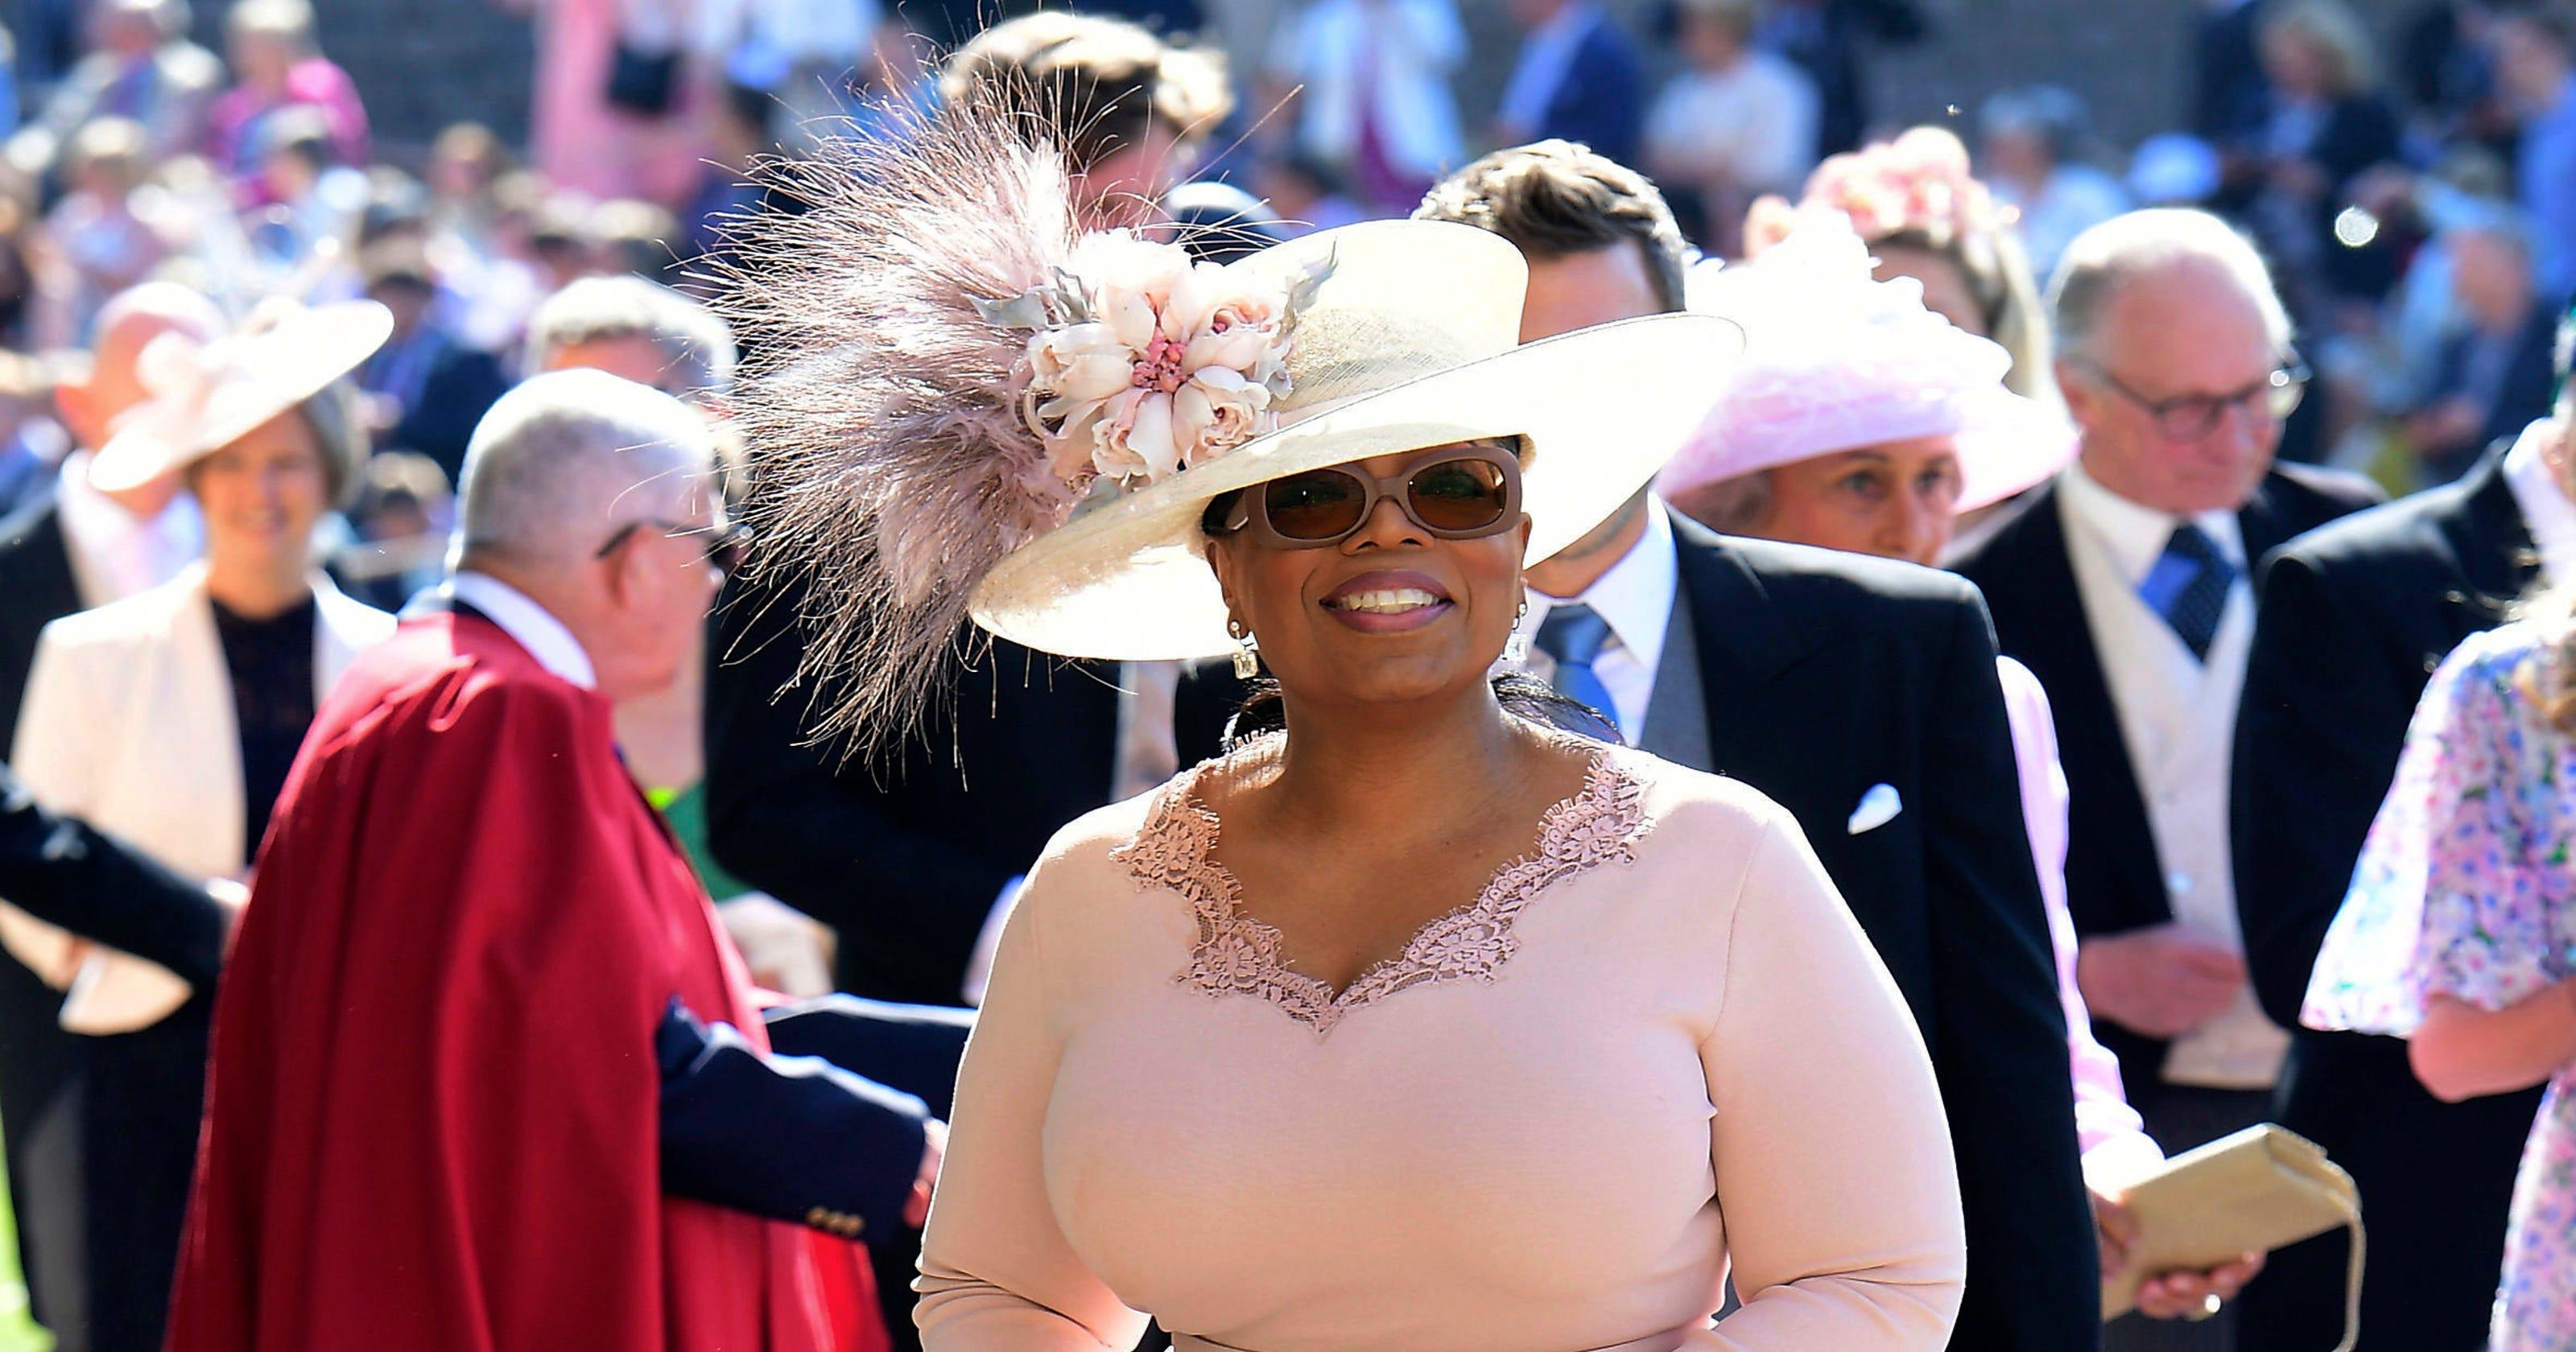 a6ddac9ba9b94 Oprah almost had a fashion faux pas at the royal wedding